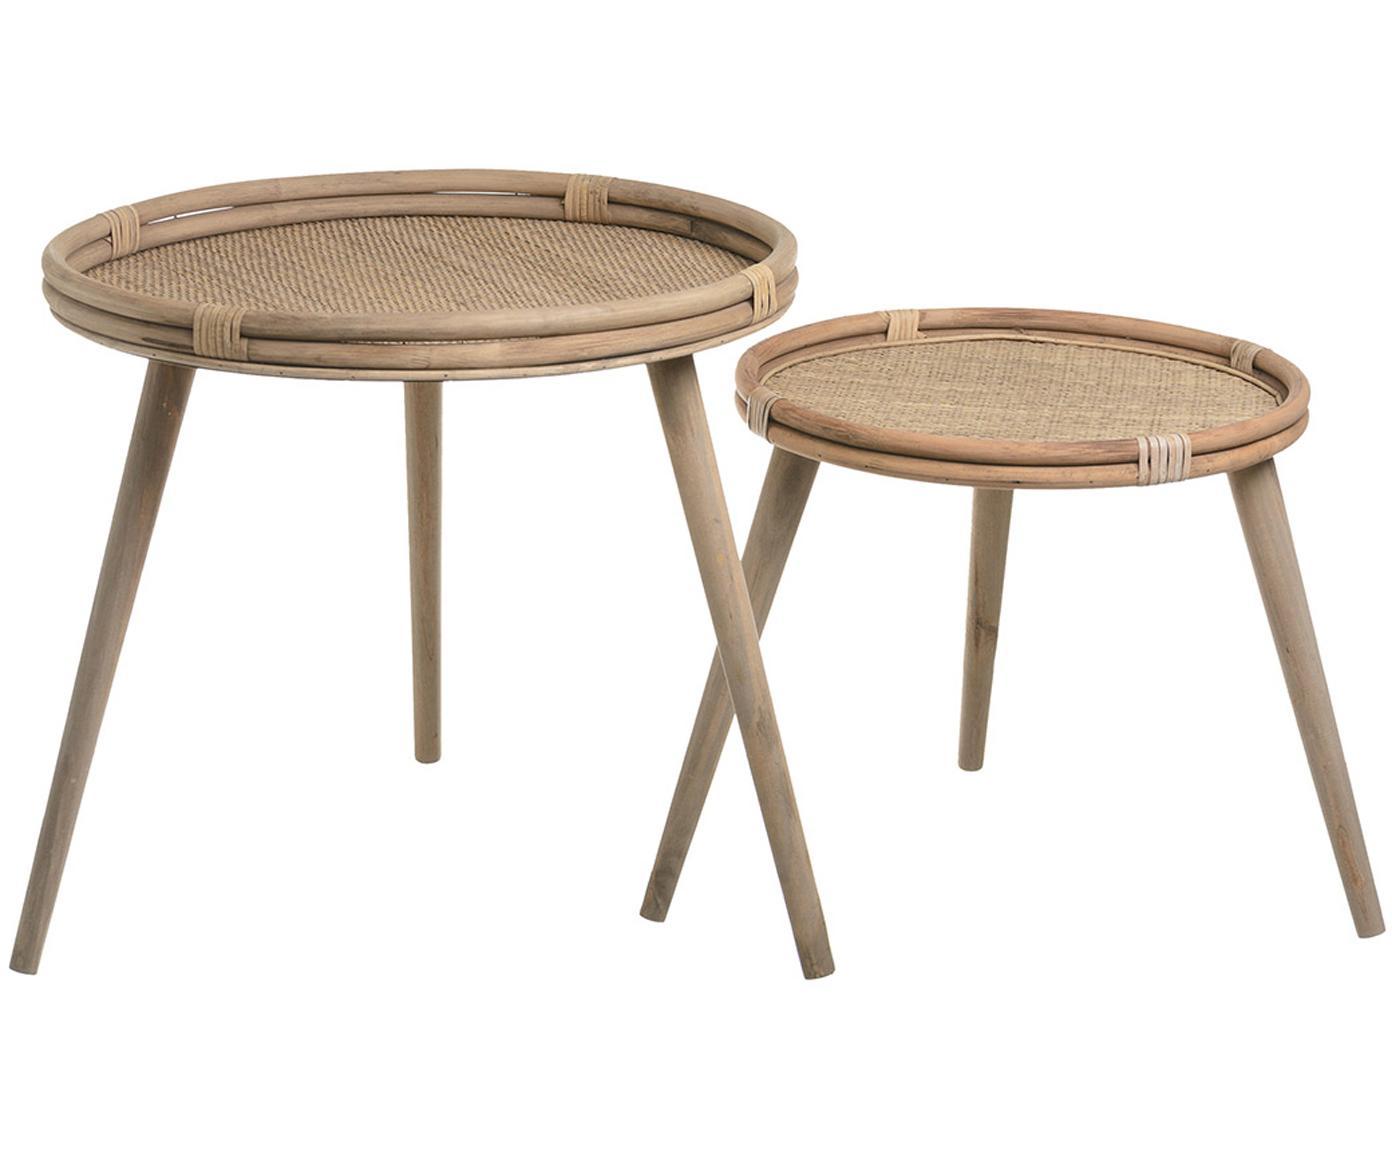 Set de mesas auxiliares Treeni, 2pzas., Ratán, Beige, Tamaños diferentes